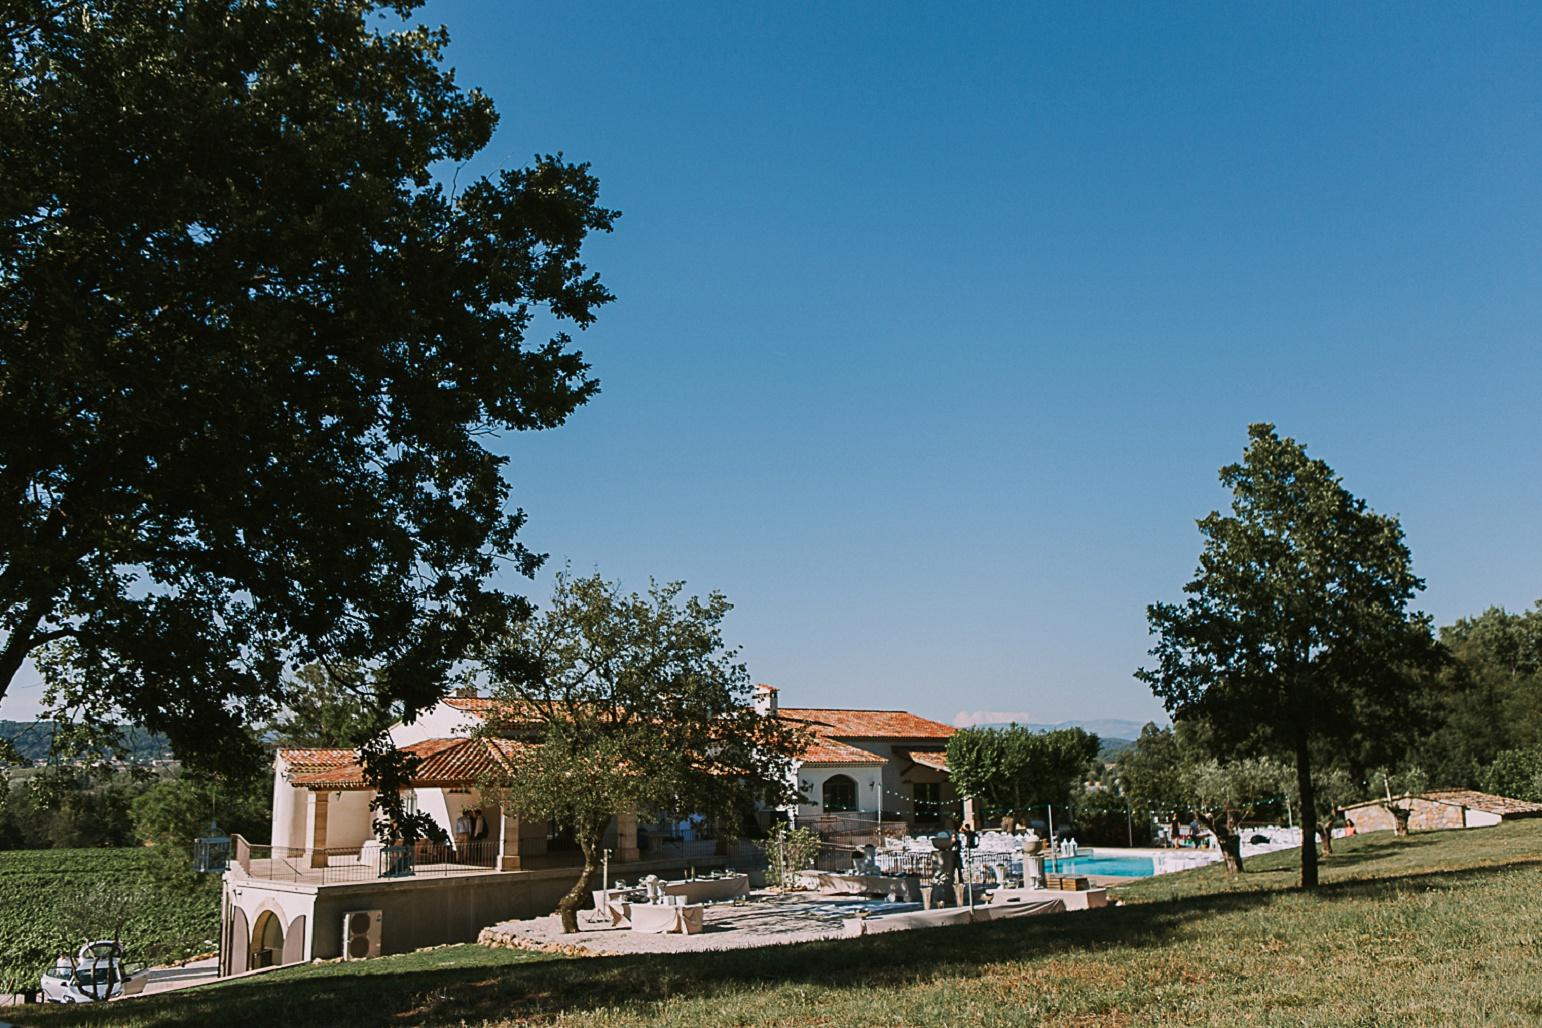 réception kateryna-photos-mariage-photographe-chateau-maime-aix-nice-provence-wedding-venue-arcs-sur-argens_0081.jpg